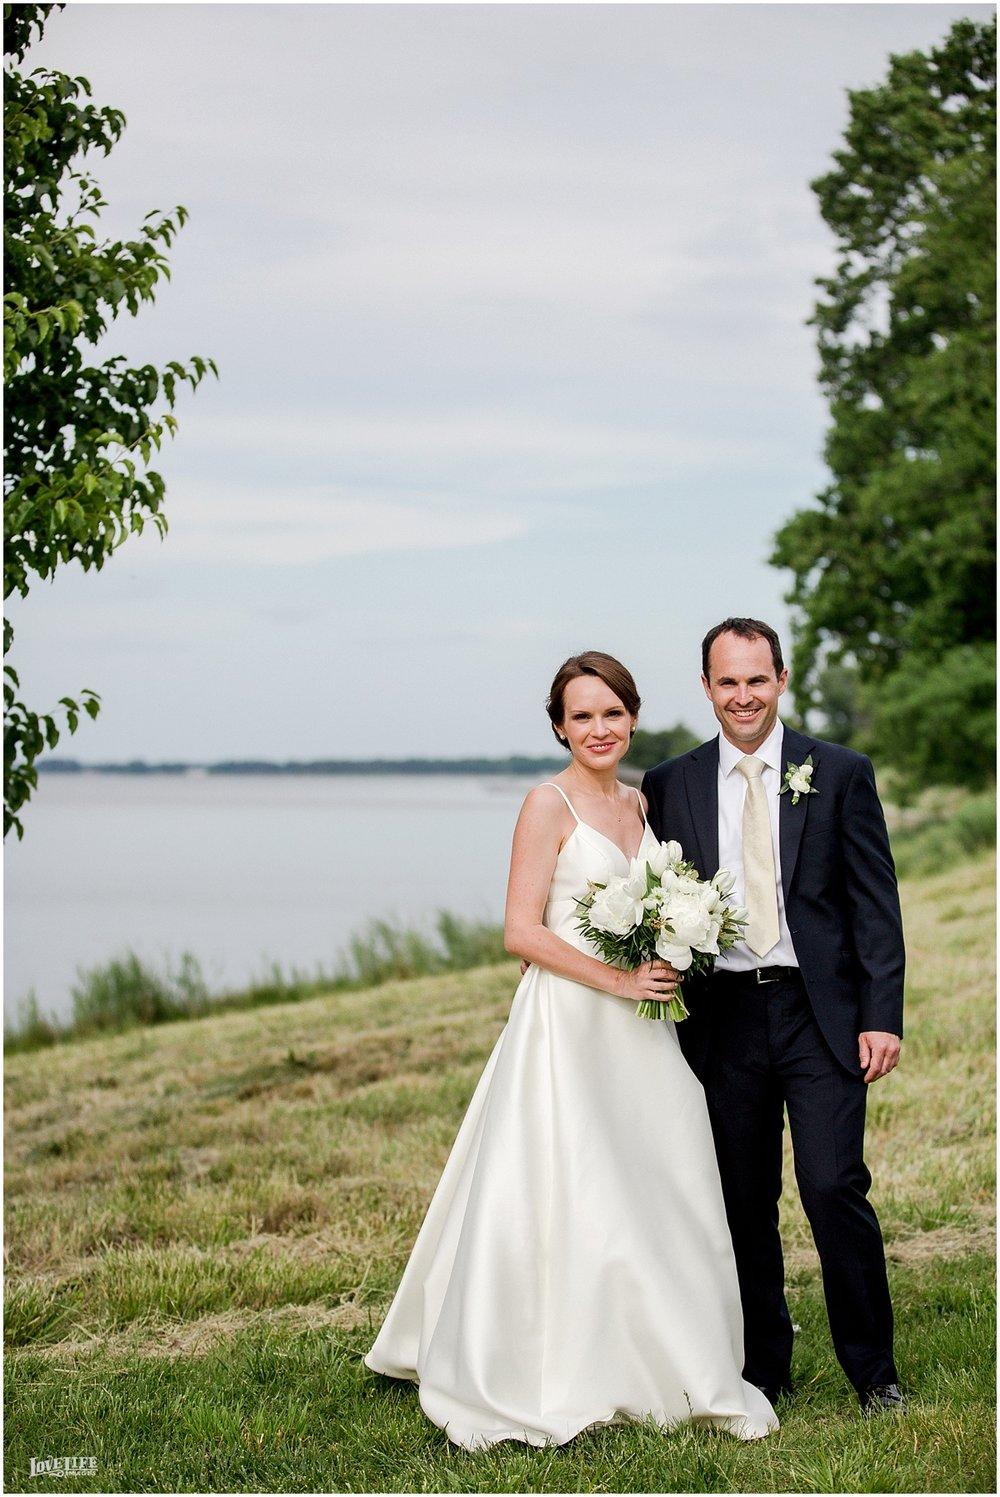 Hyatt Chesapeake Bay Wedding bride and groom waterfront portrait.jpg